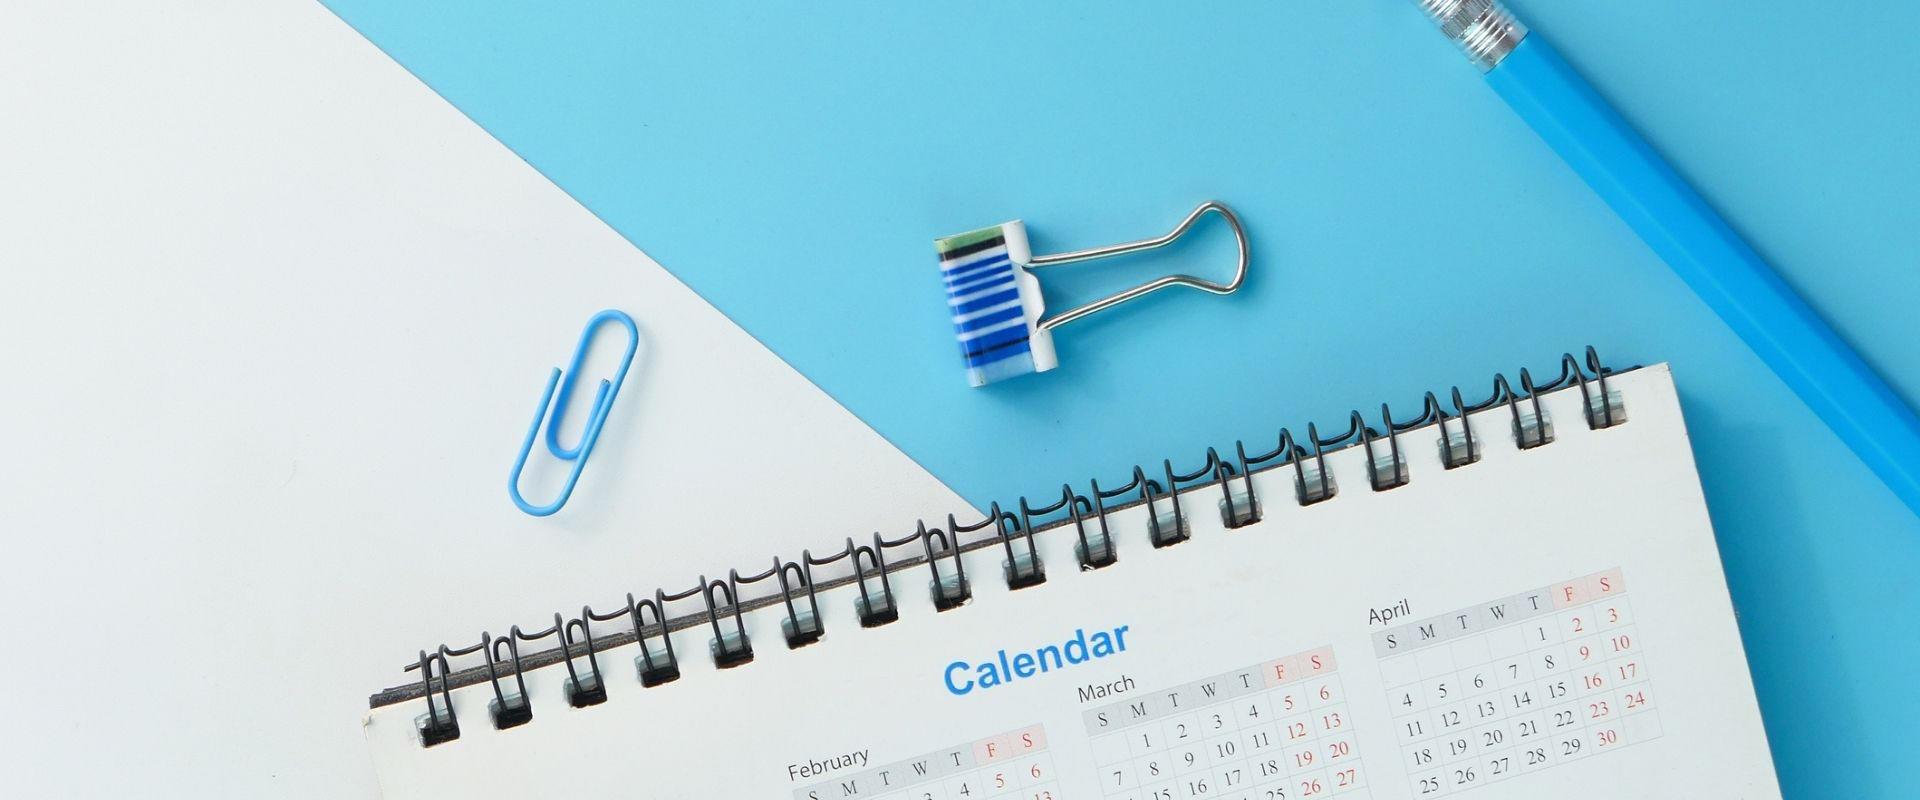 Penn State Academic Calendar Fall 2022.Important Dates Liveon